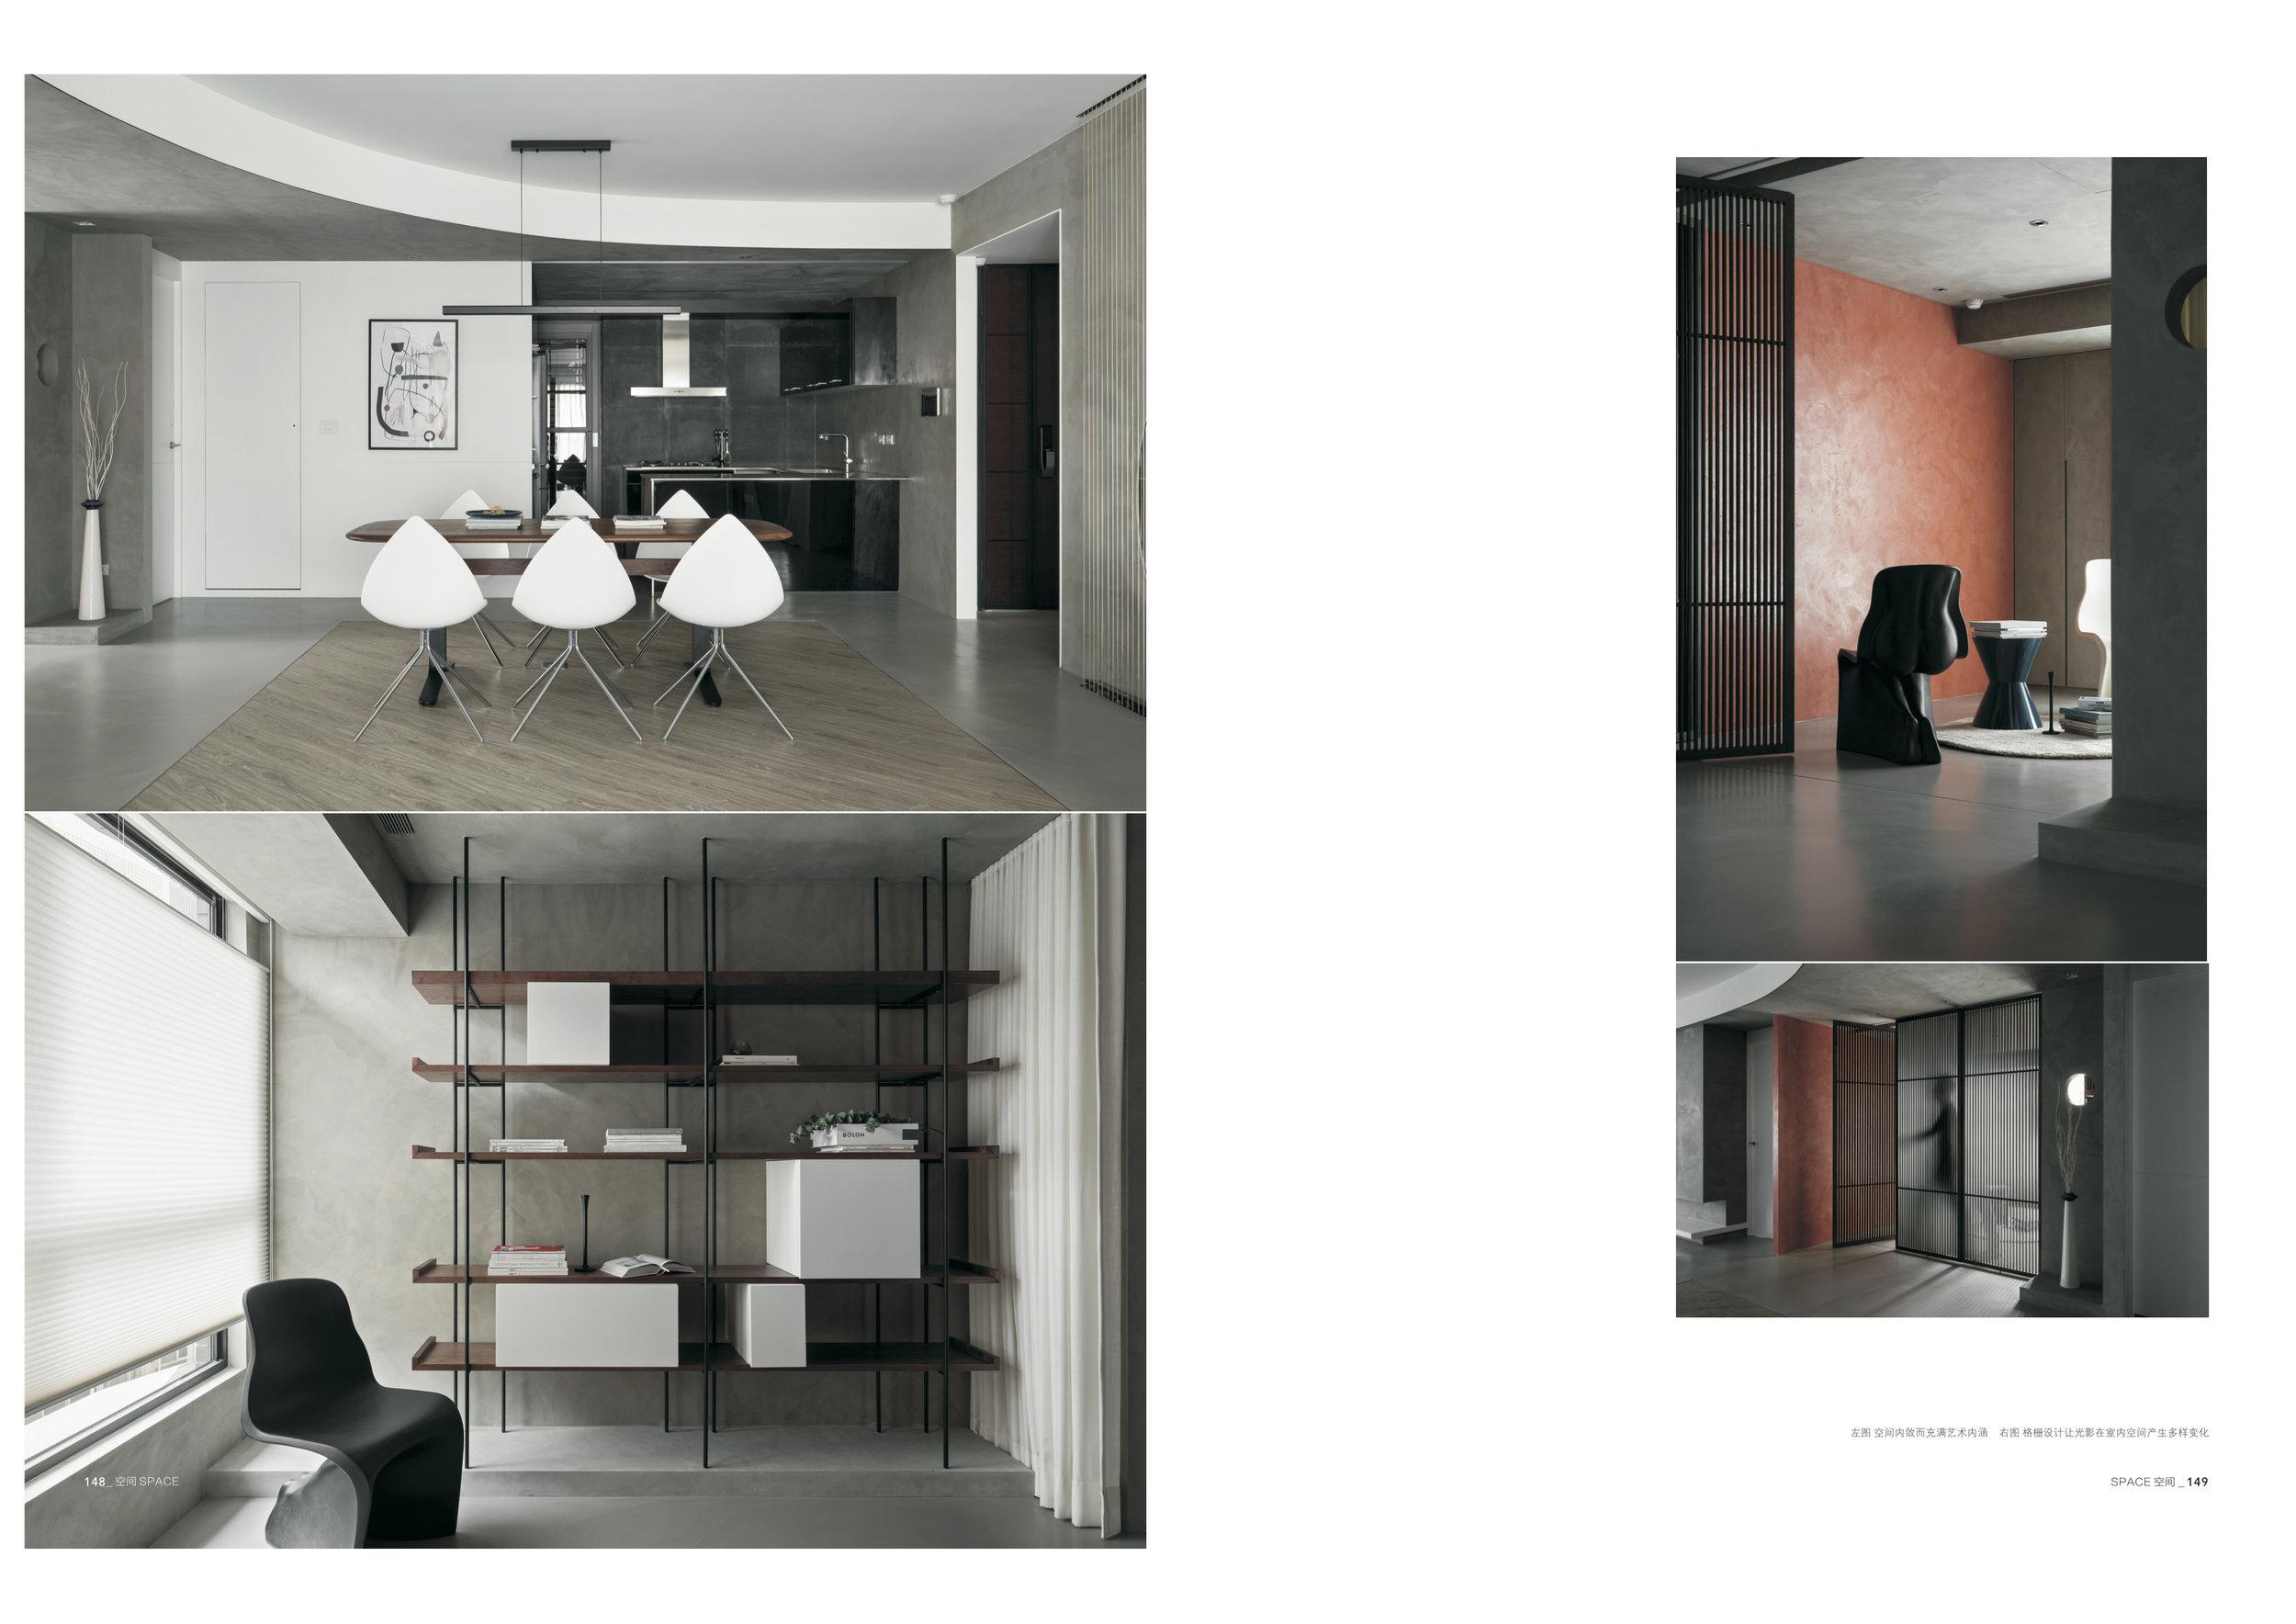 p146-151空间_未来当代之家2.jpg